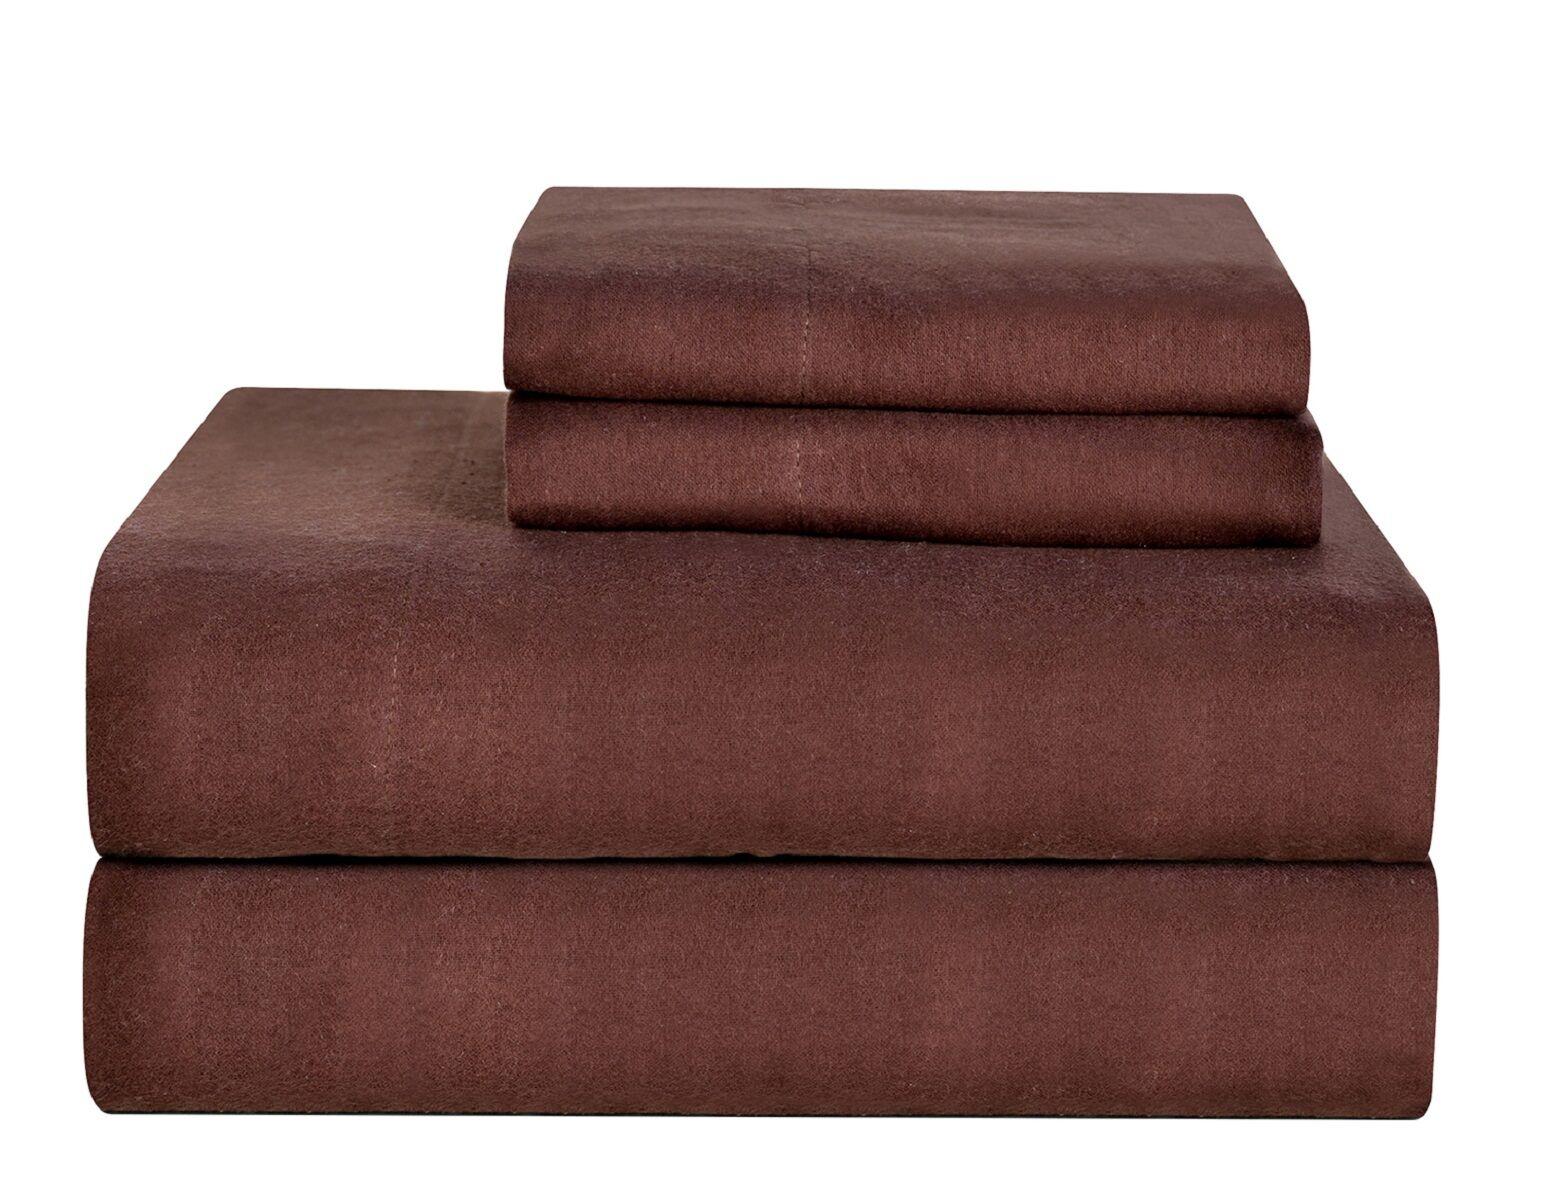 Celeste Home Ultra Soft Flannel Cotton Sheet Set Size: Twin, Color: Coffee Bean